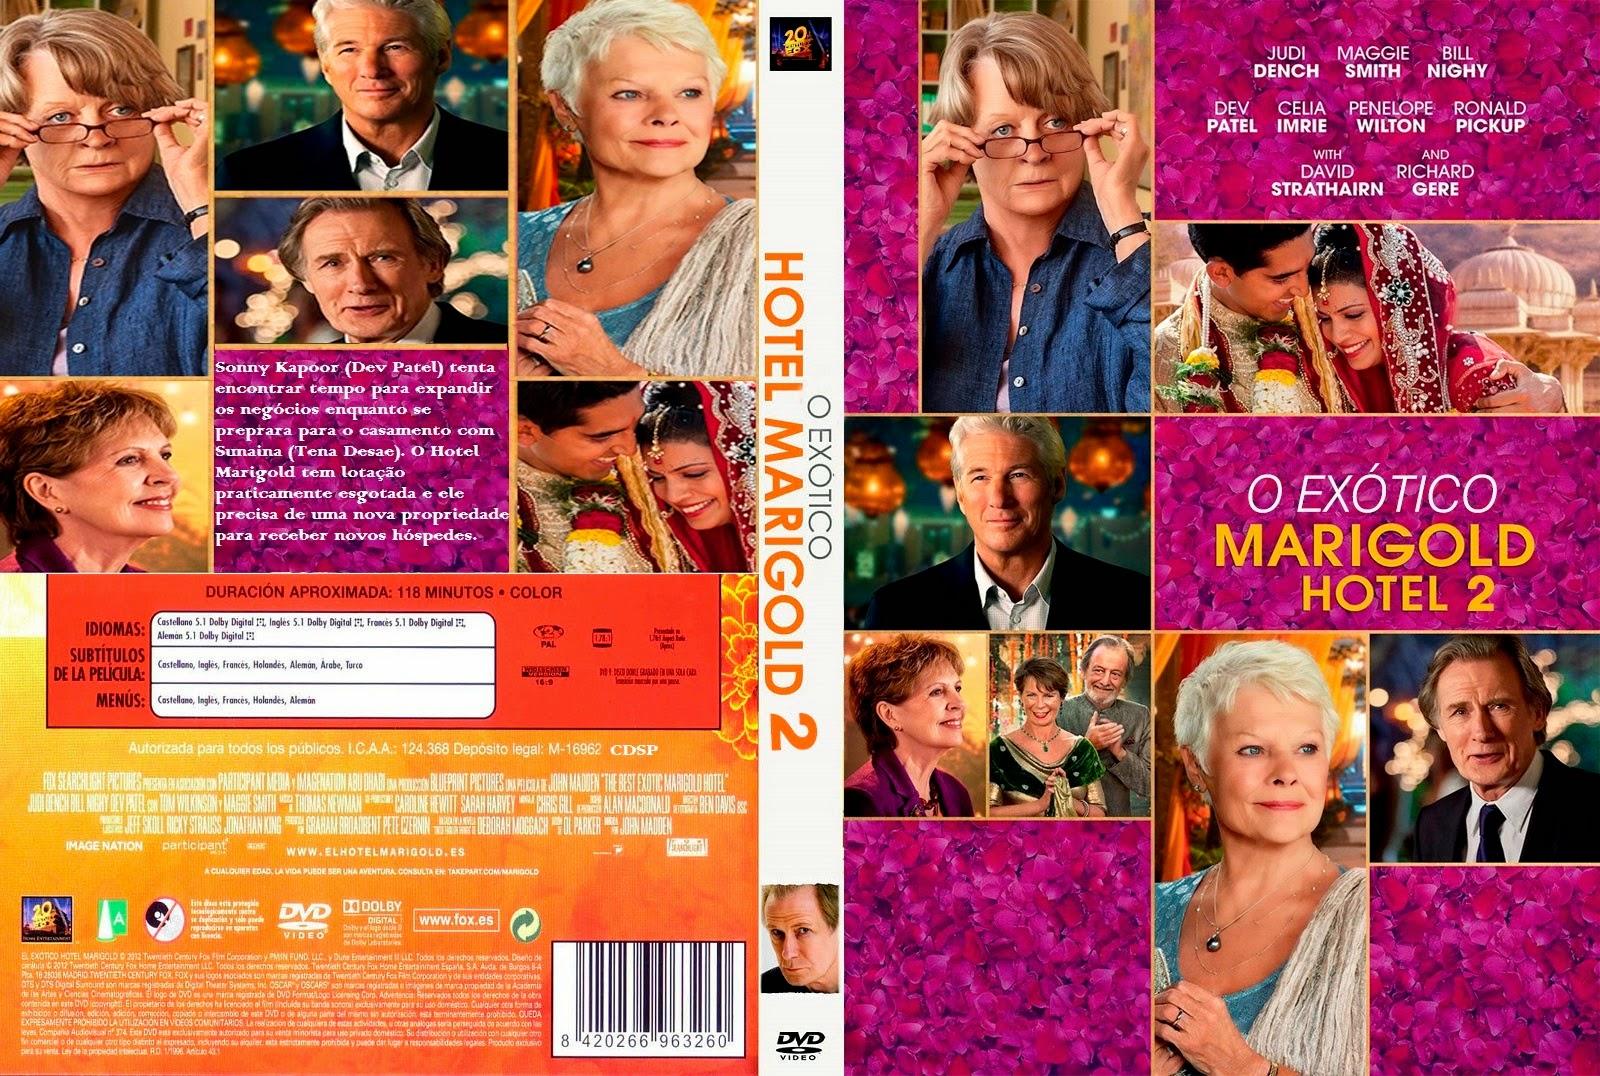 O Exótico Hotel Marigold 2 BDRip XviD Dual Áudio O 2BEXOTICO 2BHOTEL 2BMARIGOLD 2B2